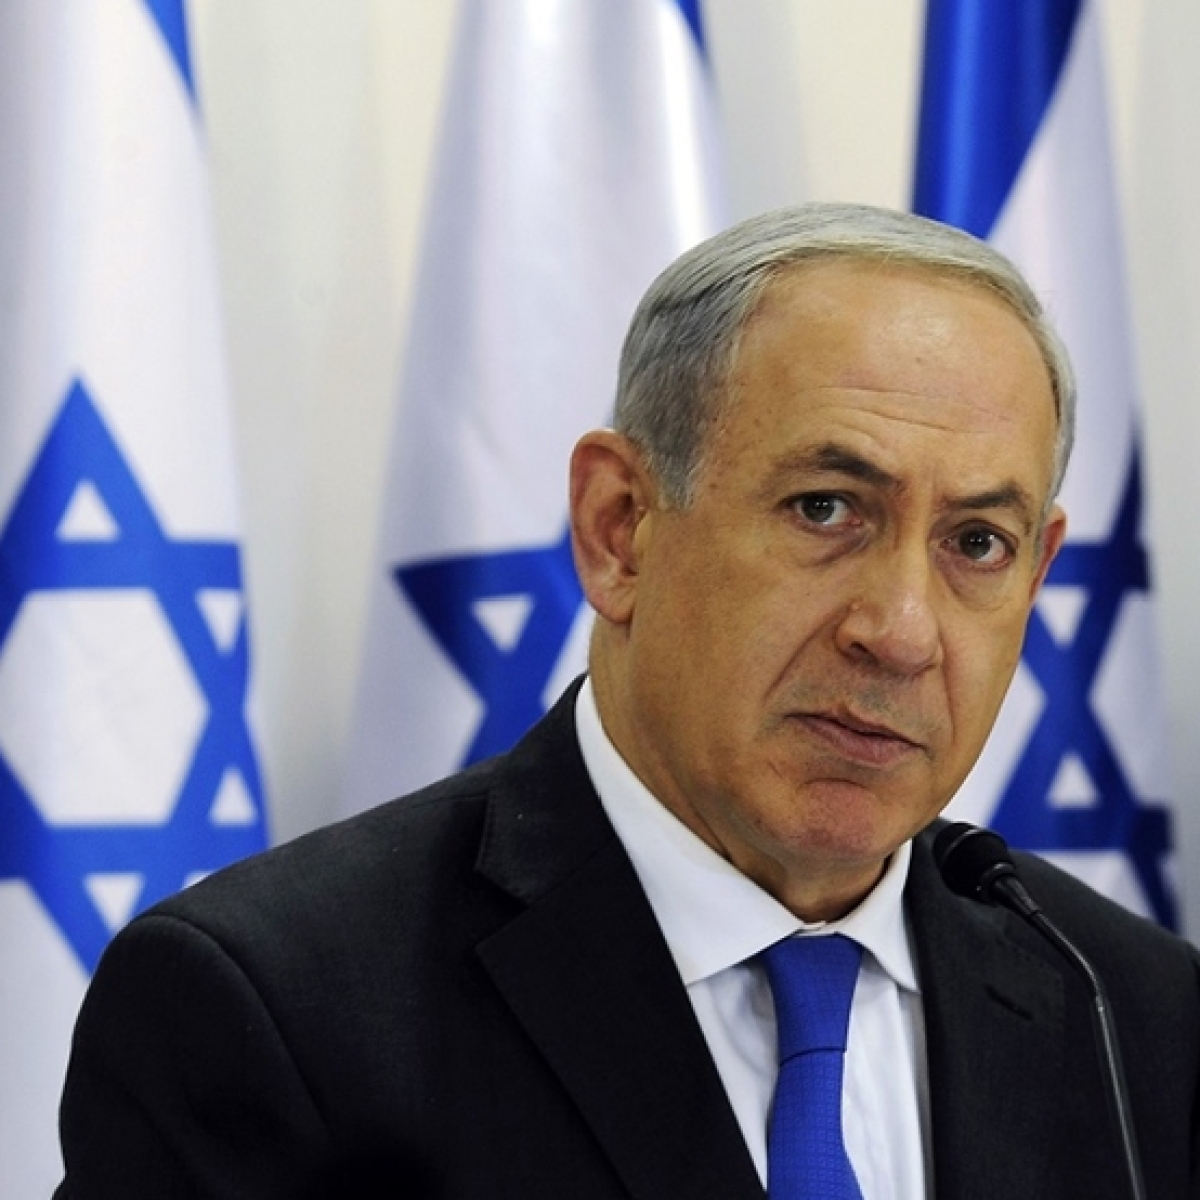 Benny Gantz intends to replace Benjamin Netanyahu as Israel's new PM